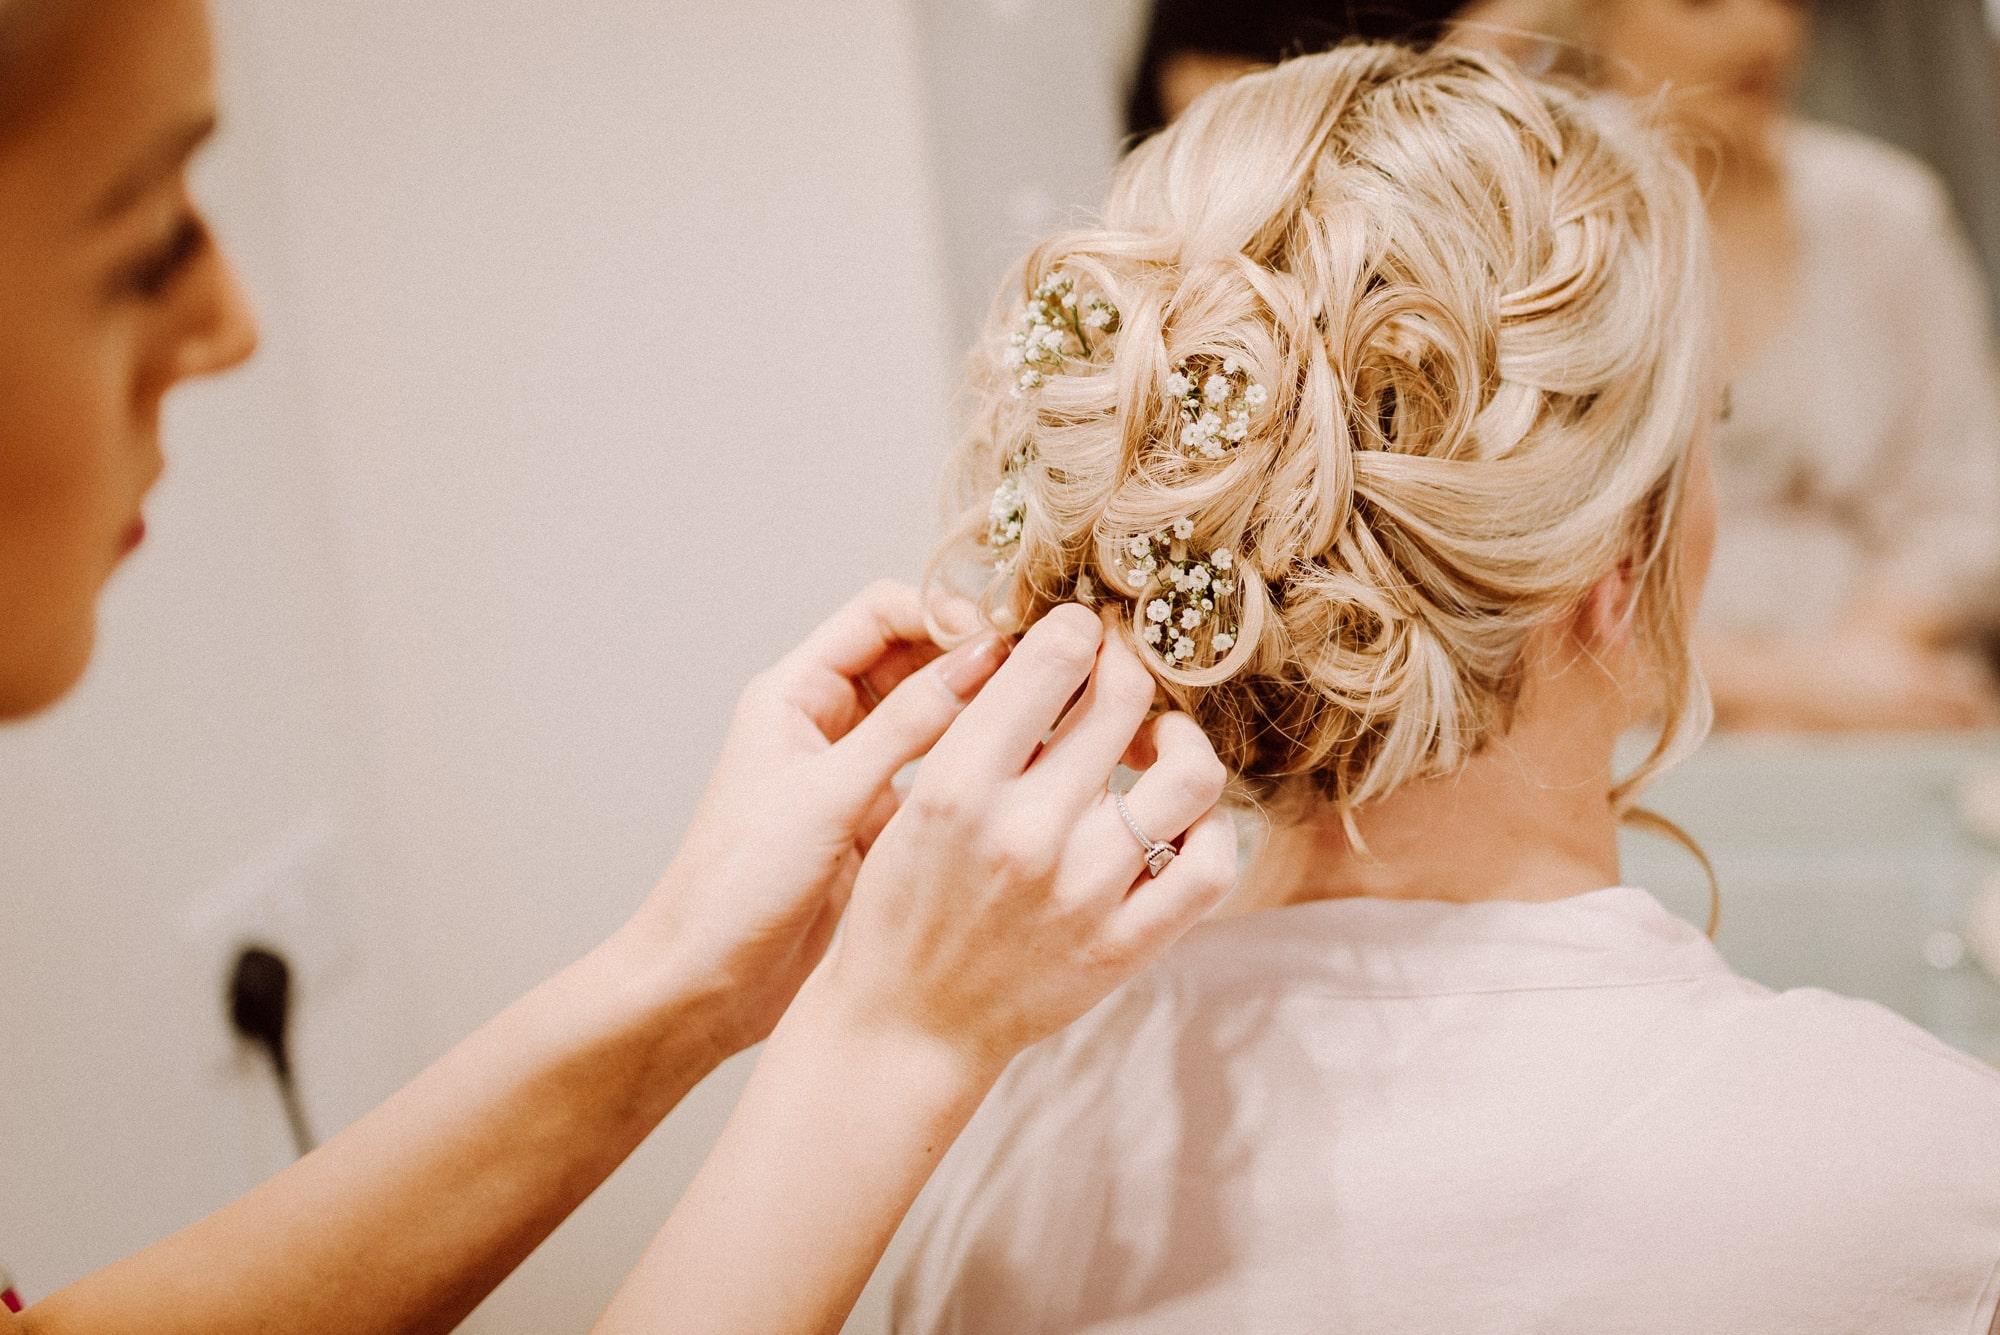 Bridal Prep Bridesmaids Wootton Park Getting Ready Bridal Prep Tianna J-Williams Wedding Photography